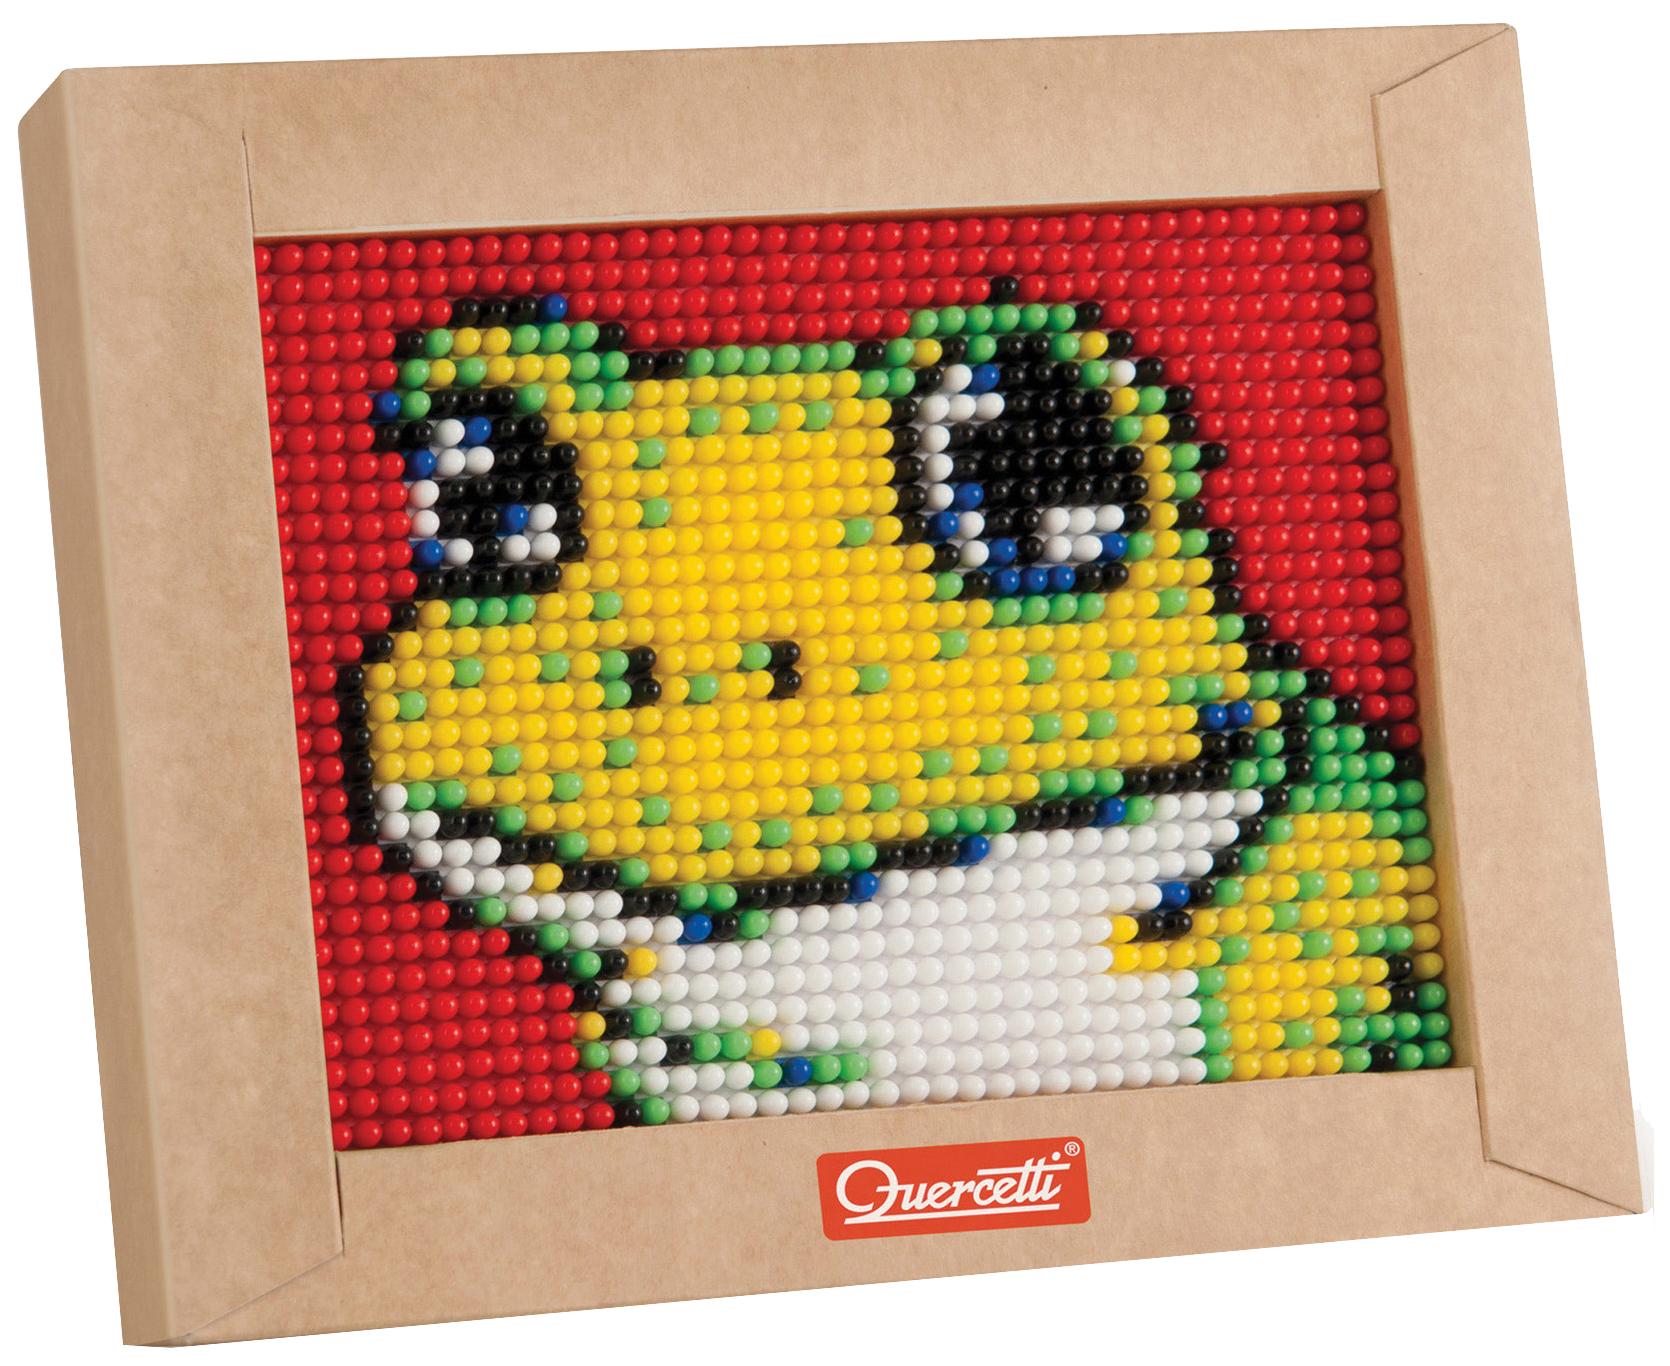 Quercetti Quercetti Пиксельная мозаика серии Мини Лягушонок